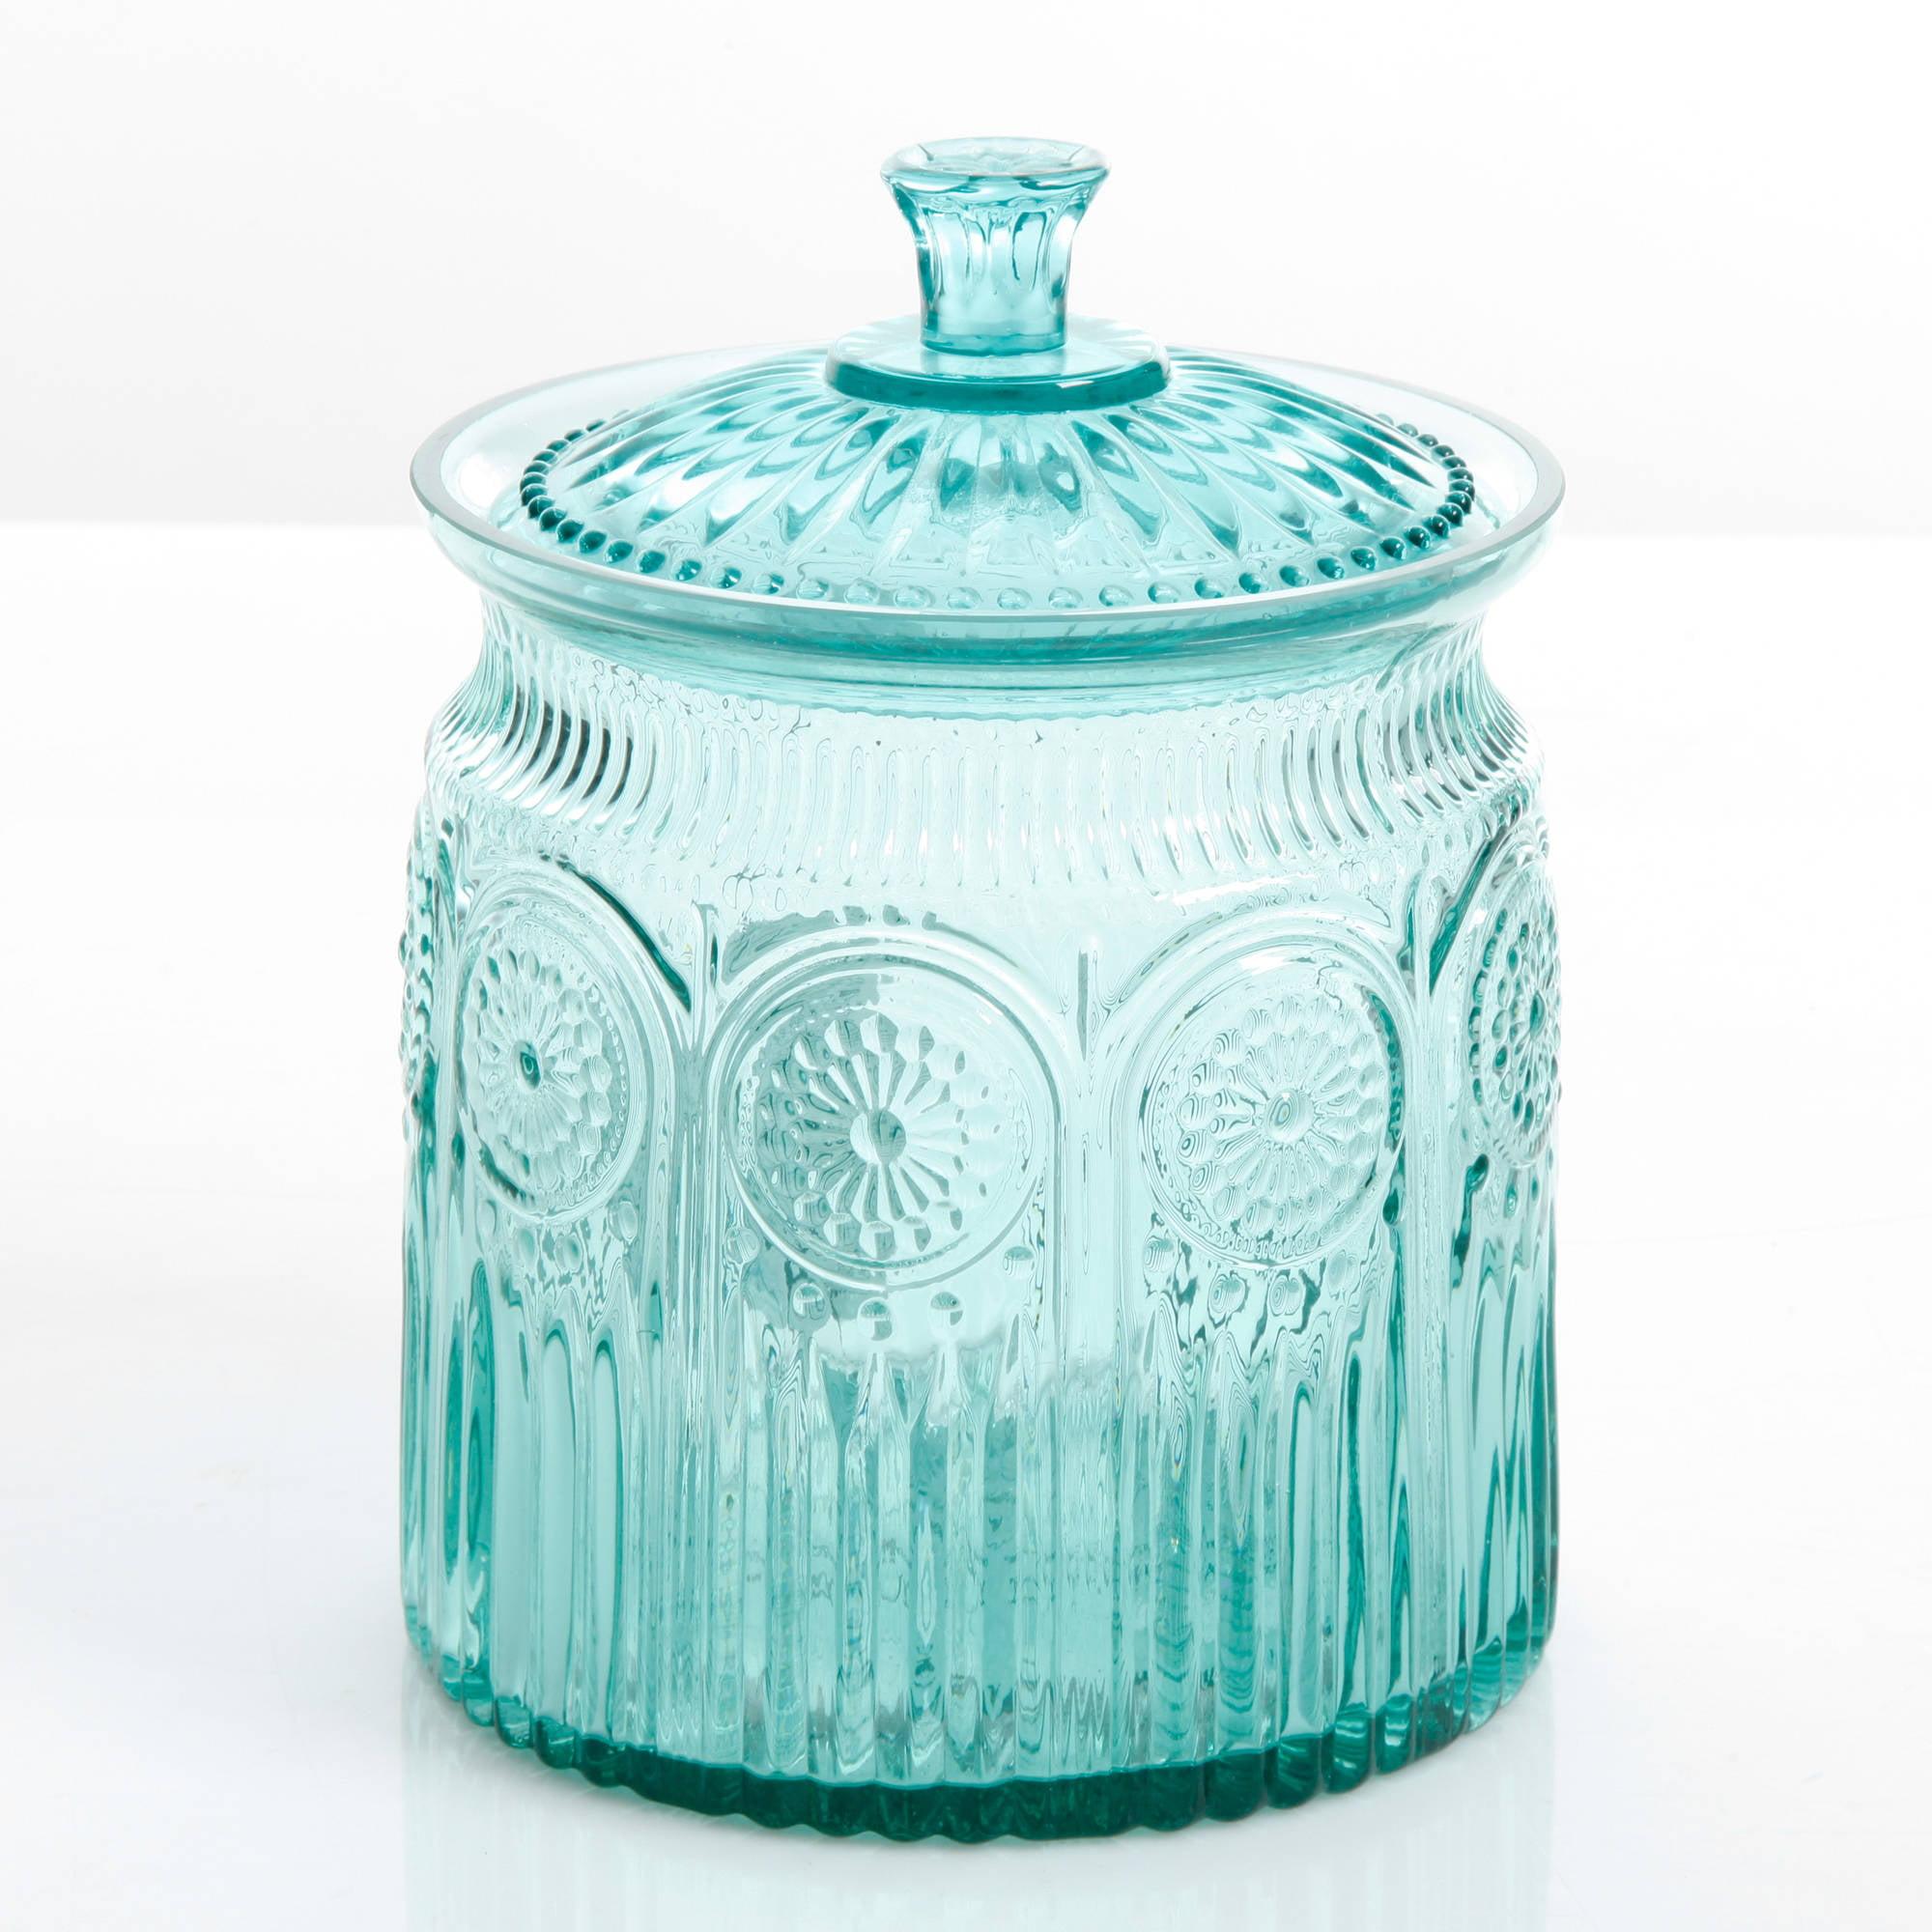 Beach Pottery Ideas: The Pioneer Woman Adeline Glass Cookie Jar